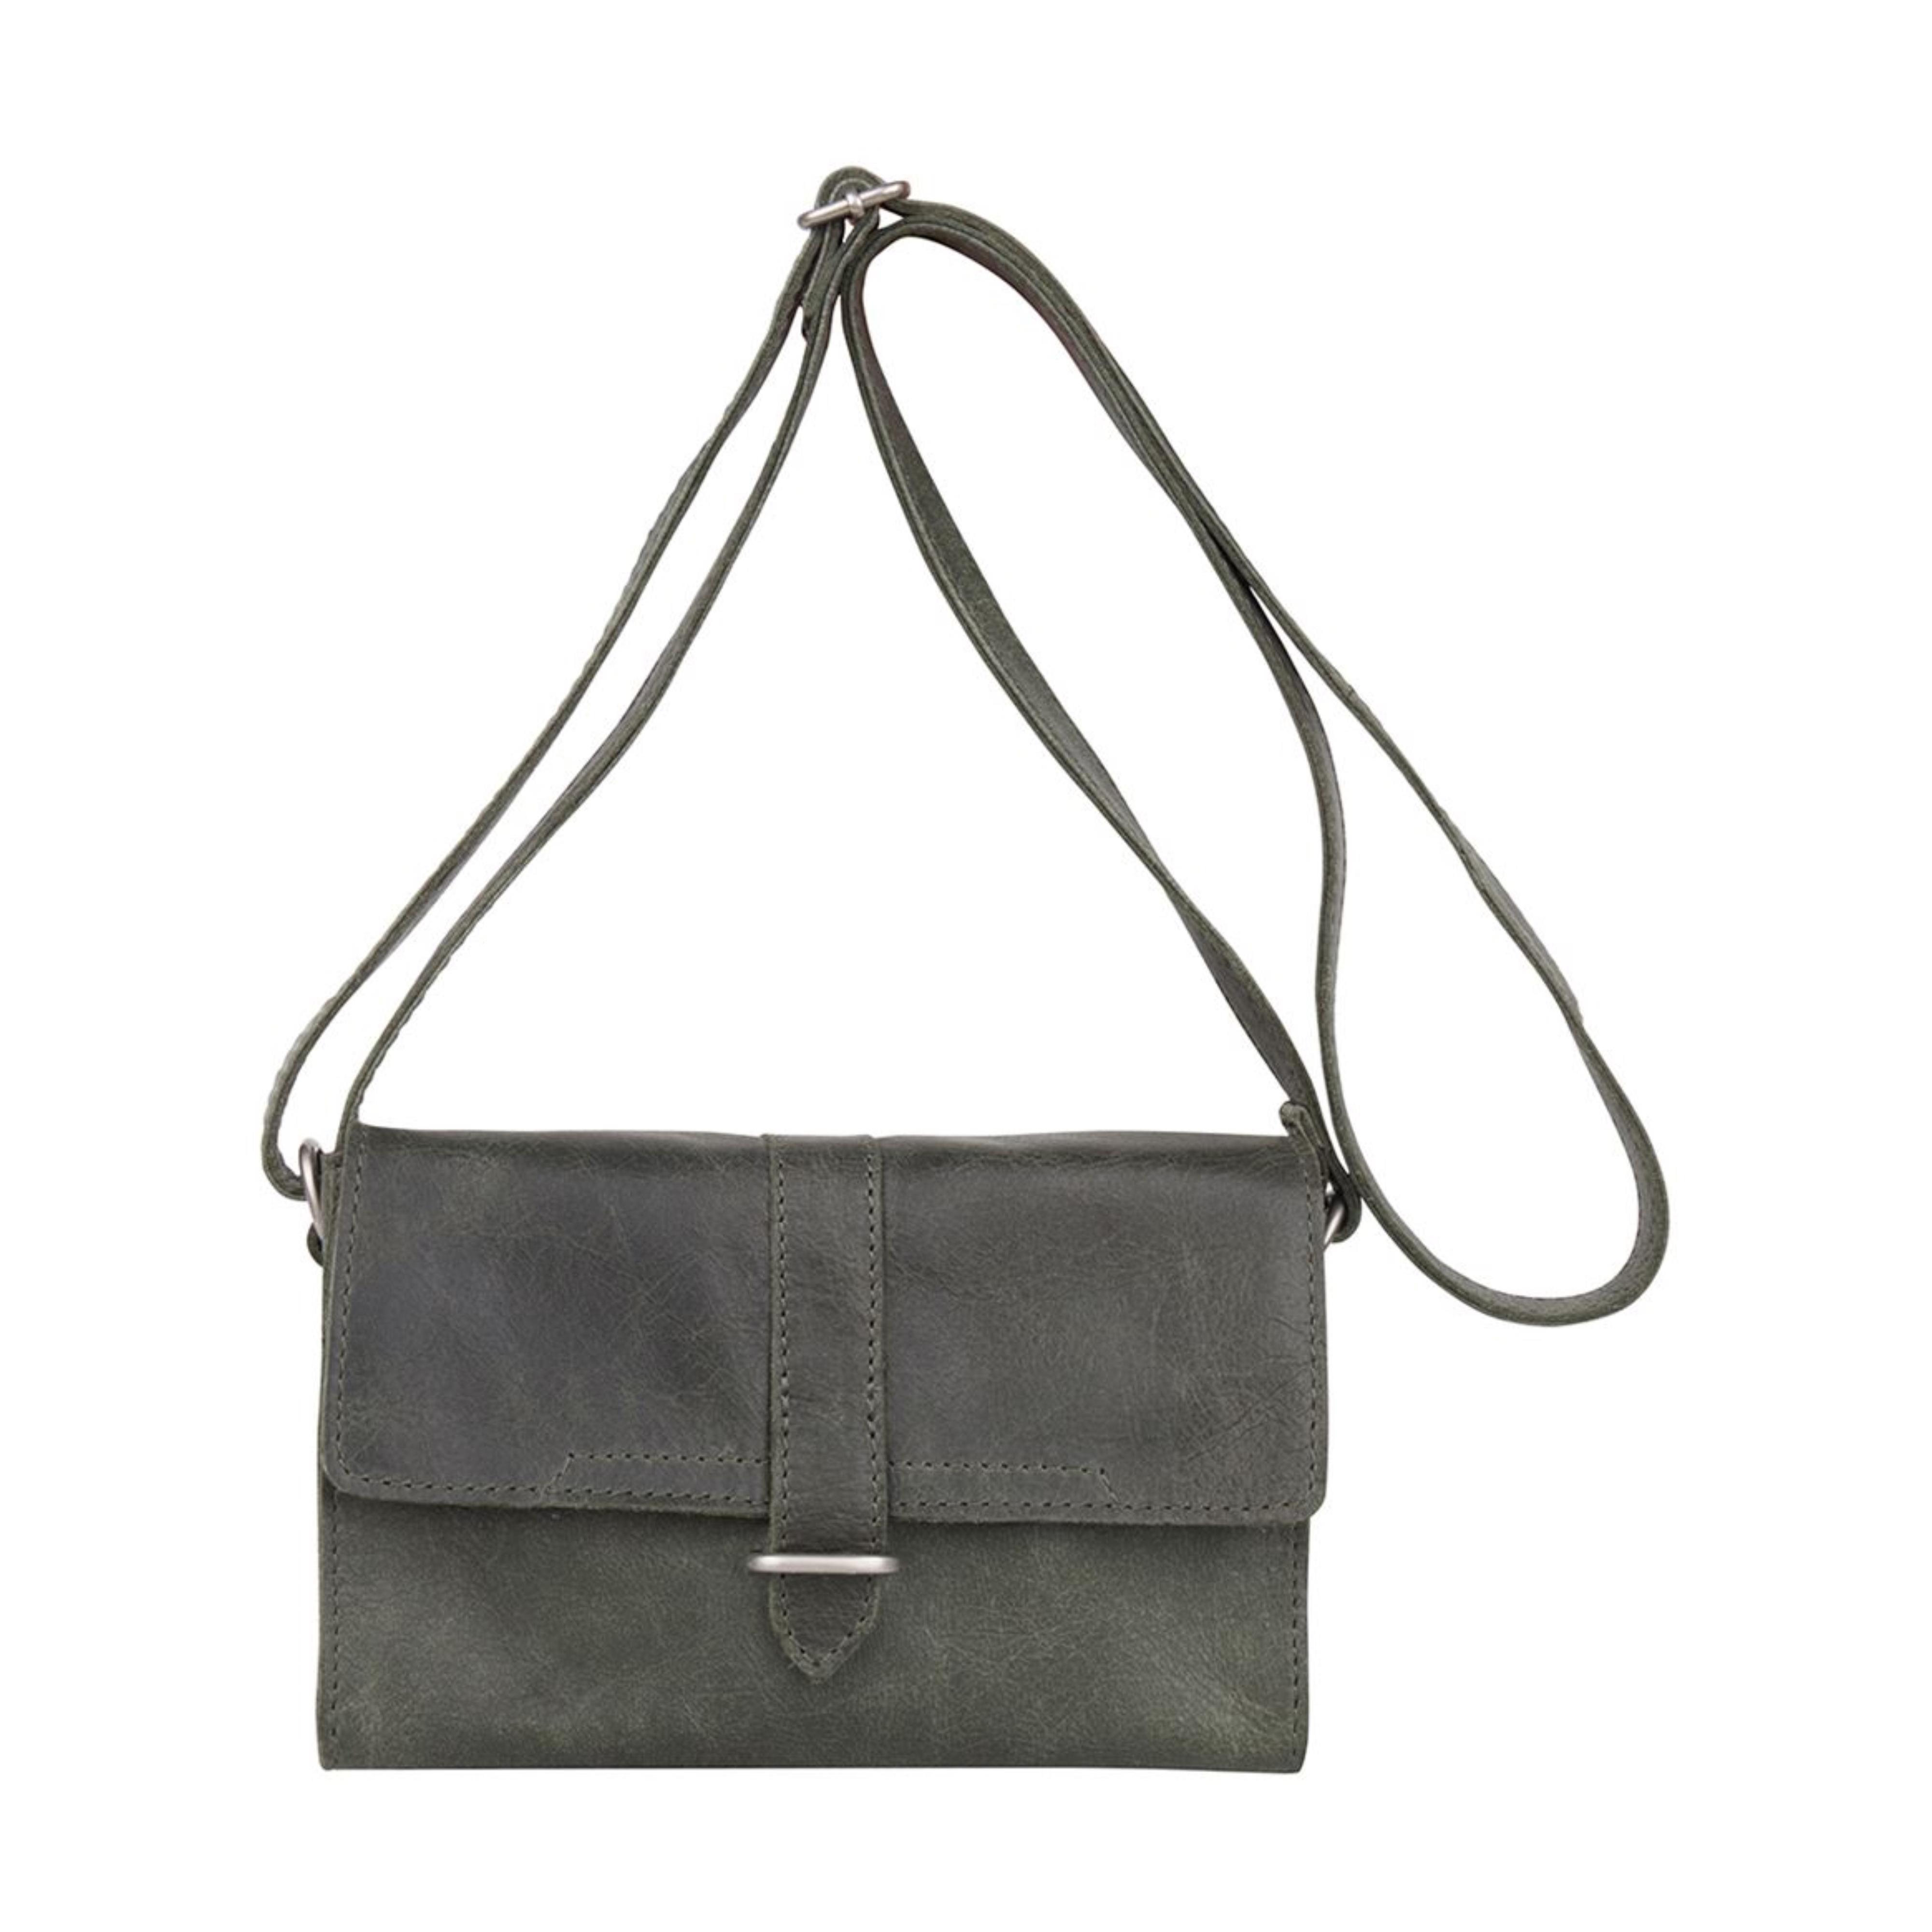 9f0c6d379ec62 COWBOYSBAG Damen Tasche Umhängetasche Bag Bayard Darkgreen 2052 001 ...